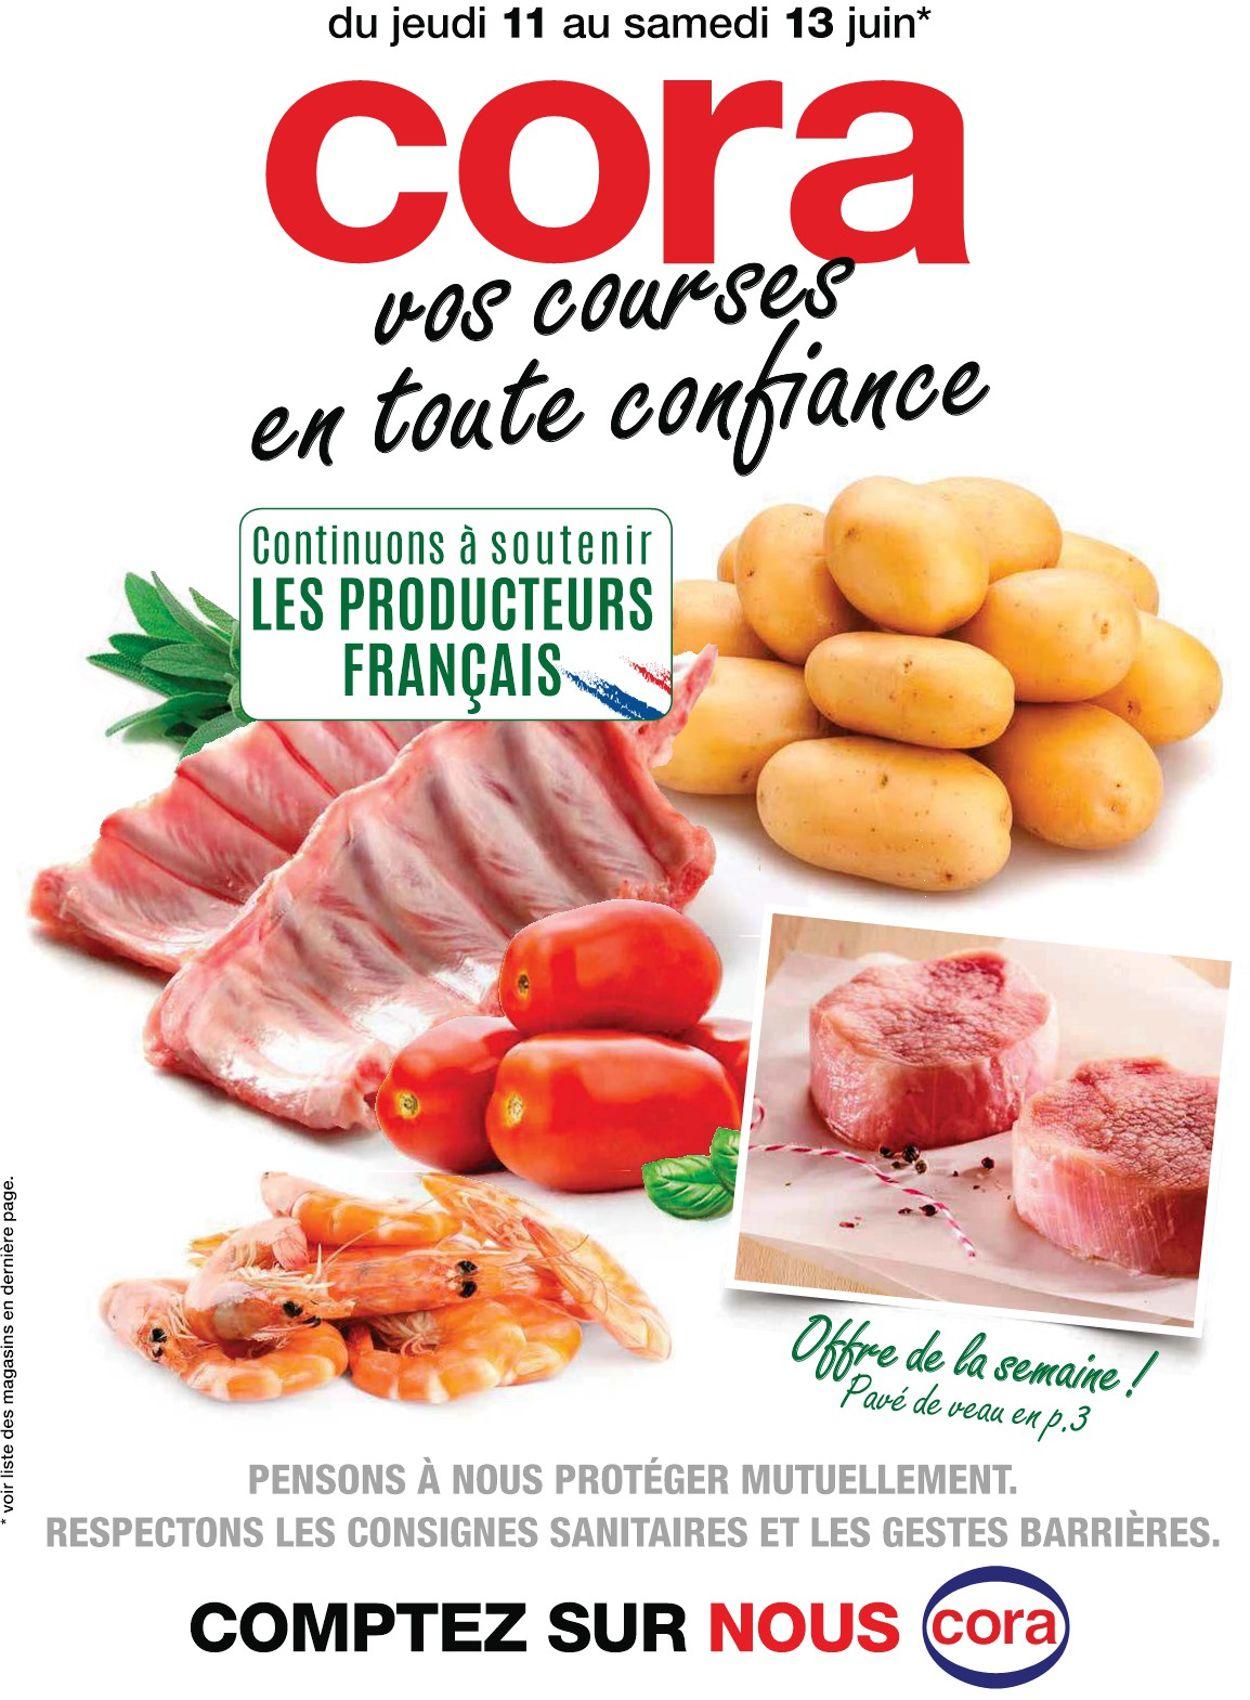 Cora Catalogue - 11.06-13.06.2020